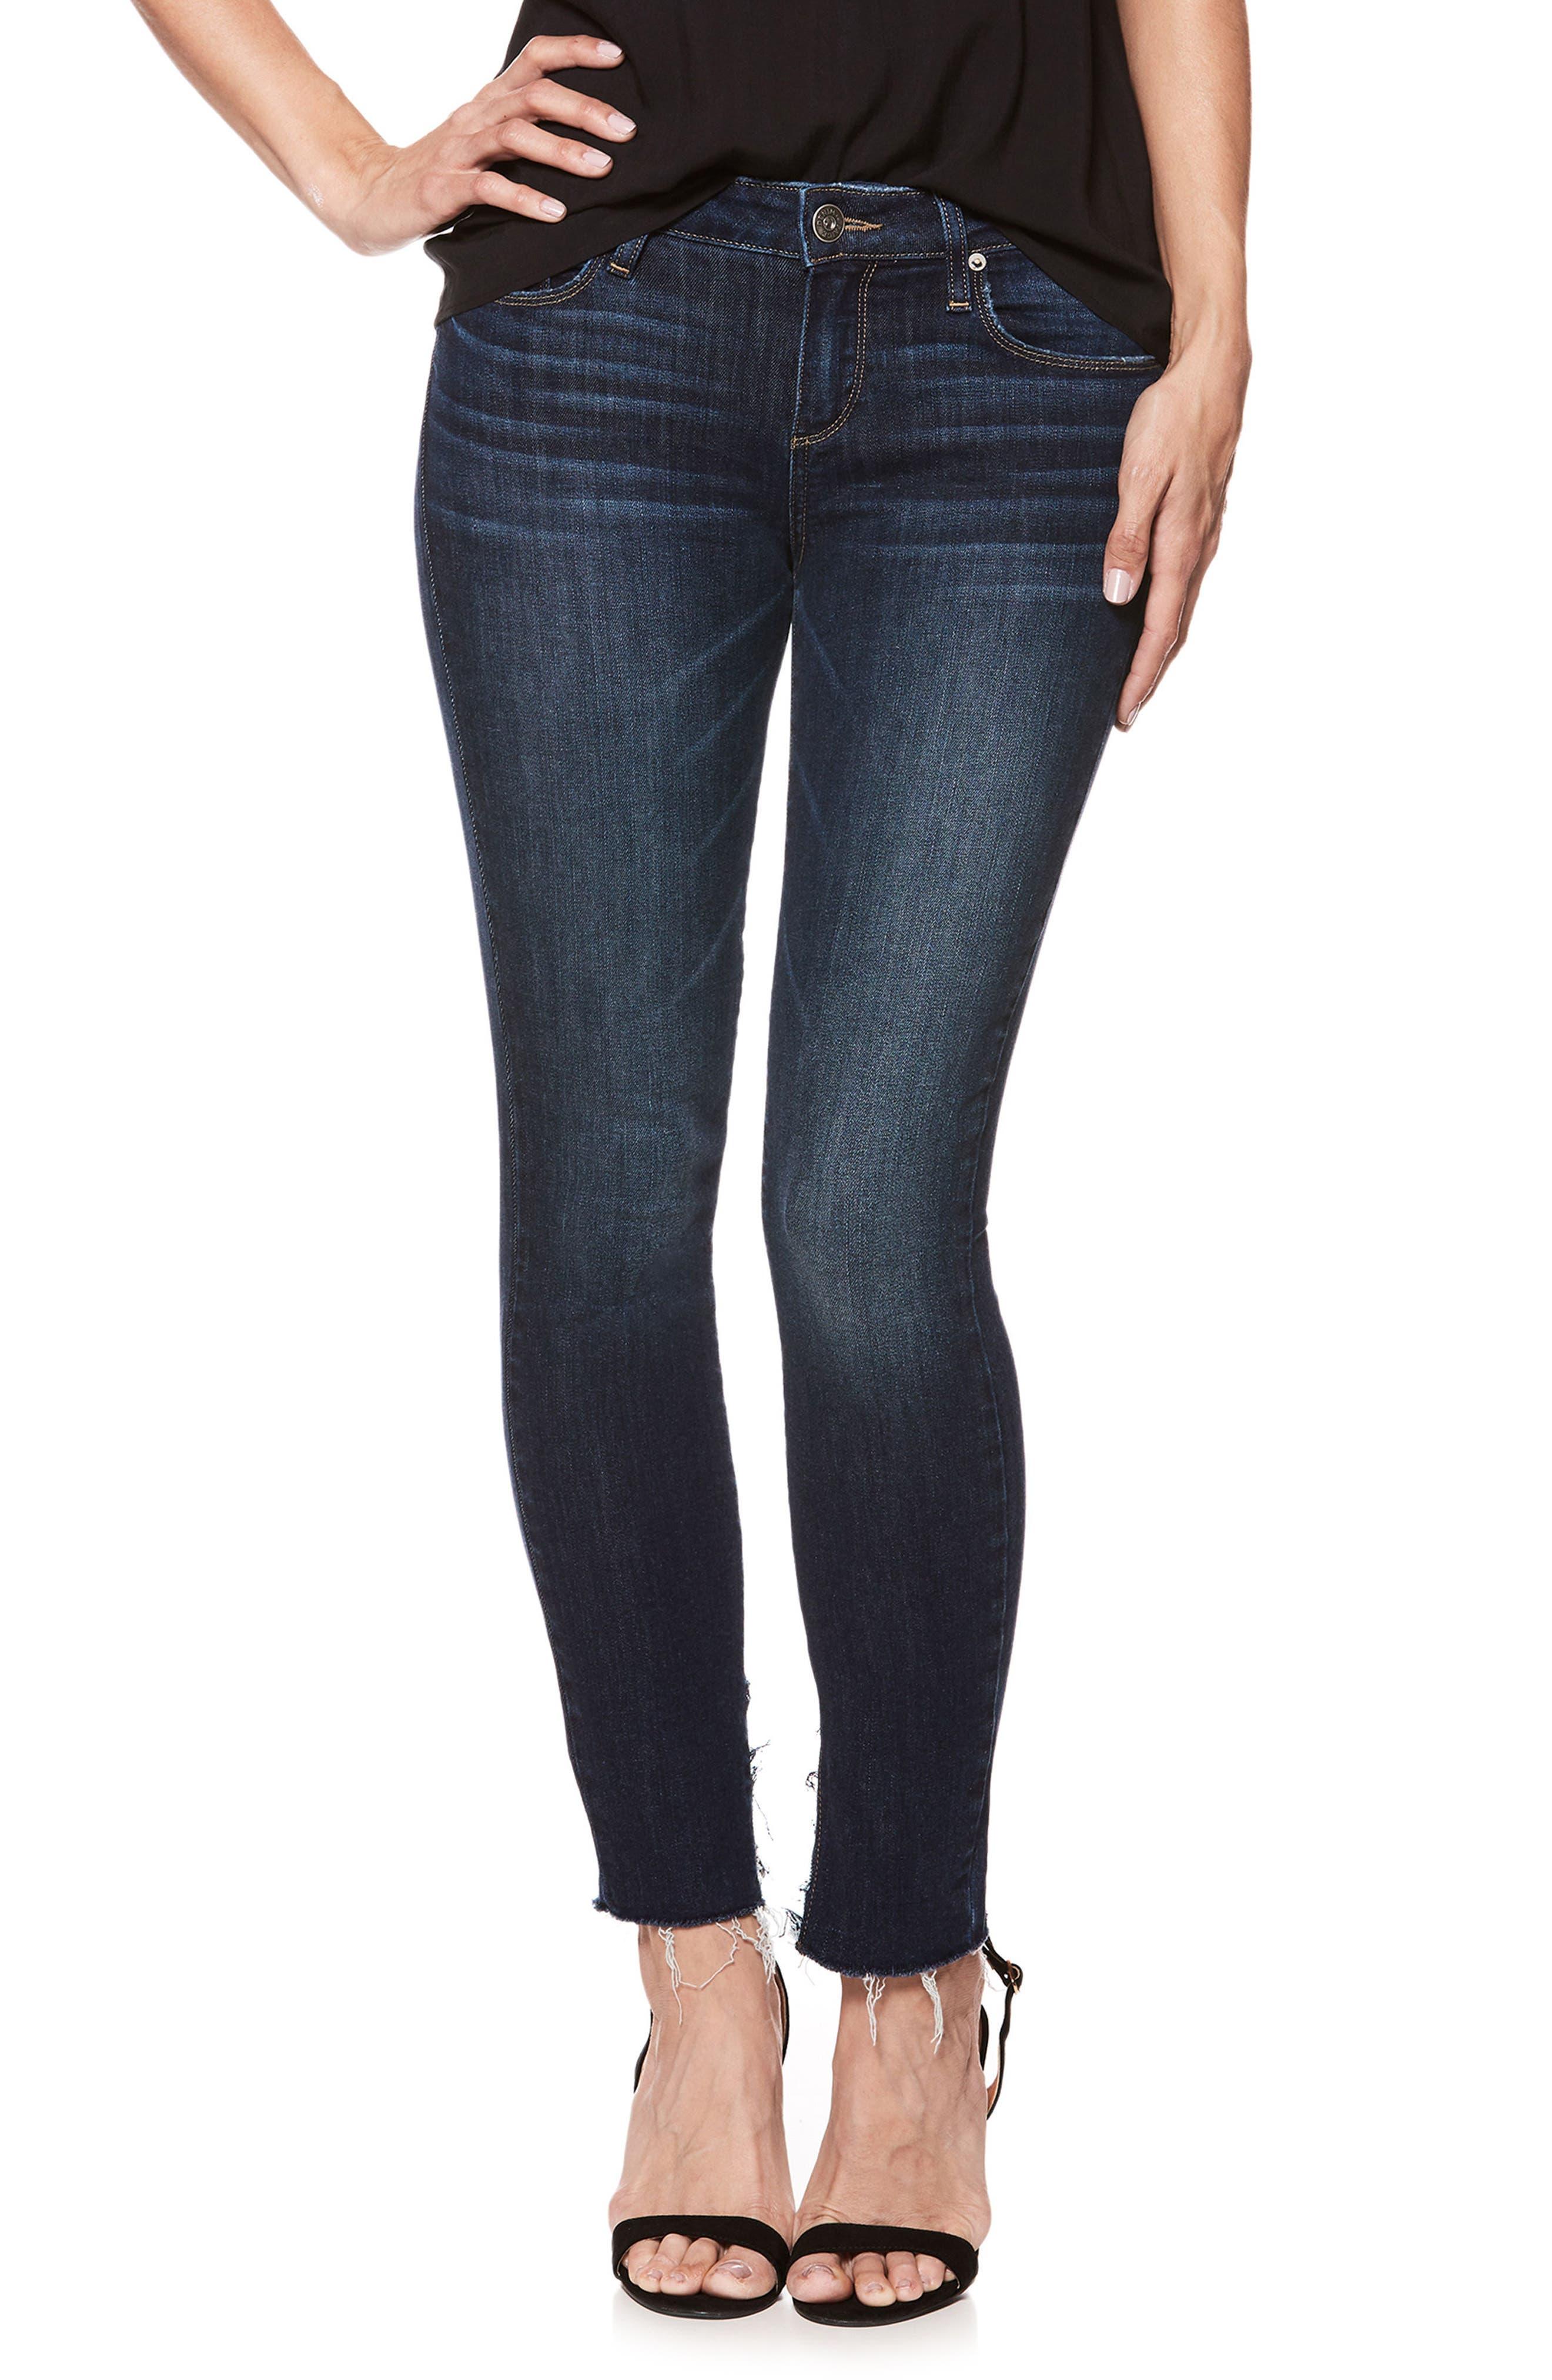 Transcend Vintage - Verdugo Ankle Ultra Skinny Jeans,                             Main thumbnail 1, color,                             Mazzetti